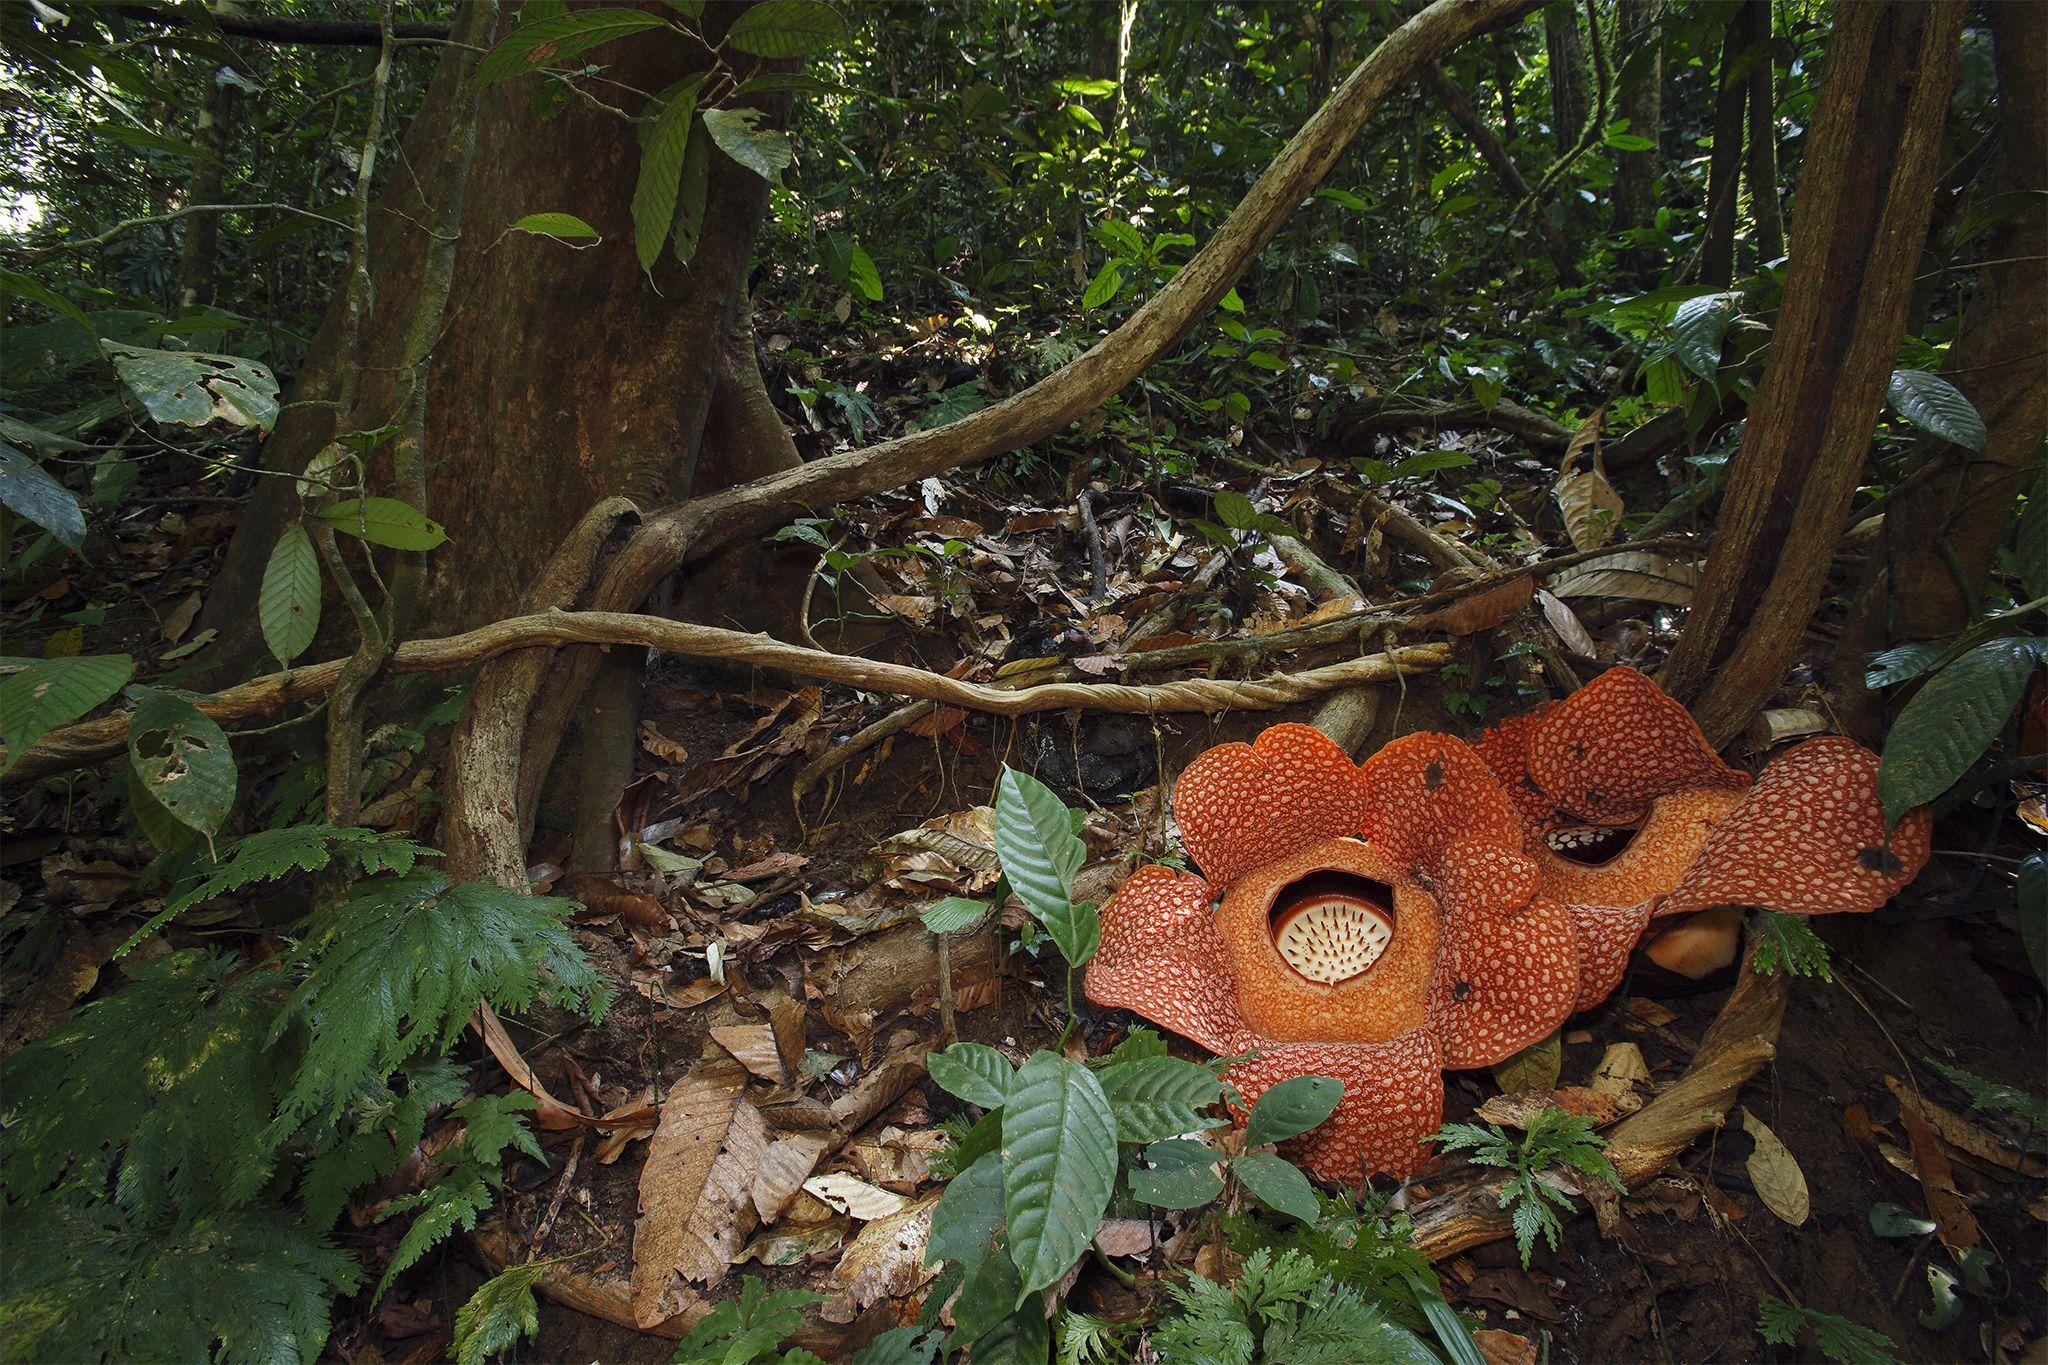 Rafflesia Corpse Flower Http Voices Nationalgeographic Com Files 2014 06 Ww Weird Pollinator 03 Jpg Pollination Big Flowers Corpse Flower